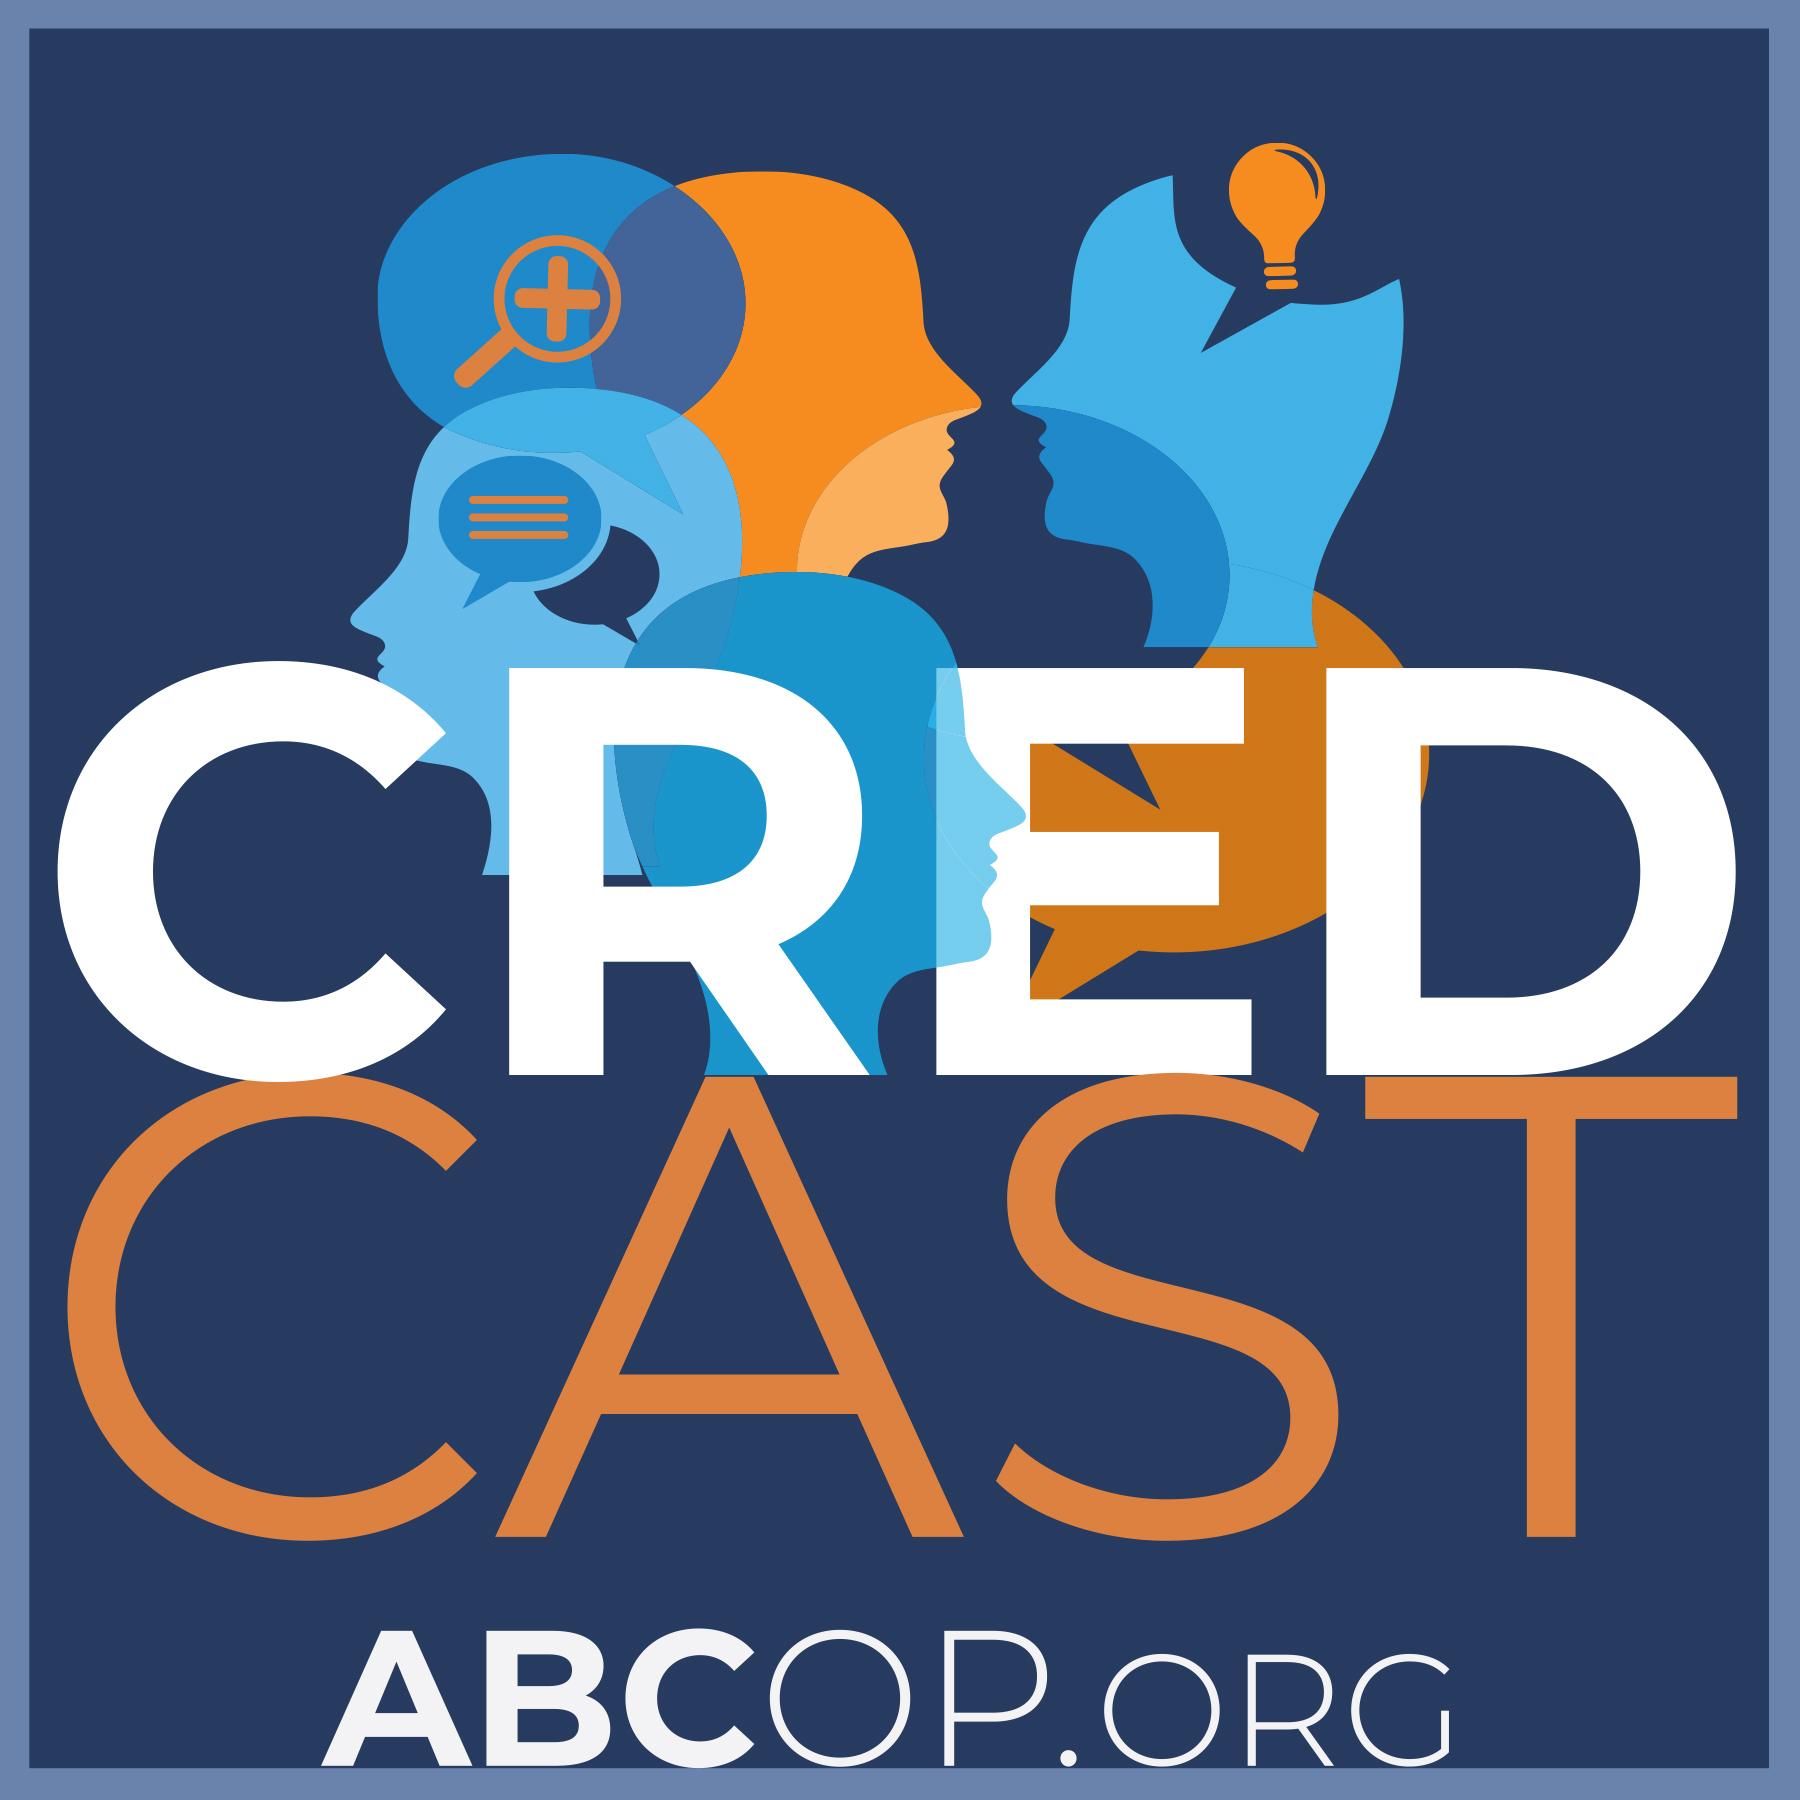 ABC CredCast show art